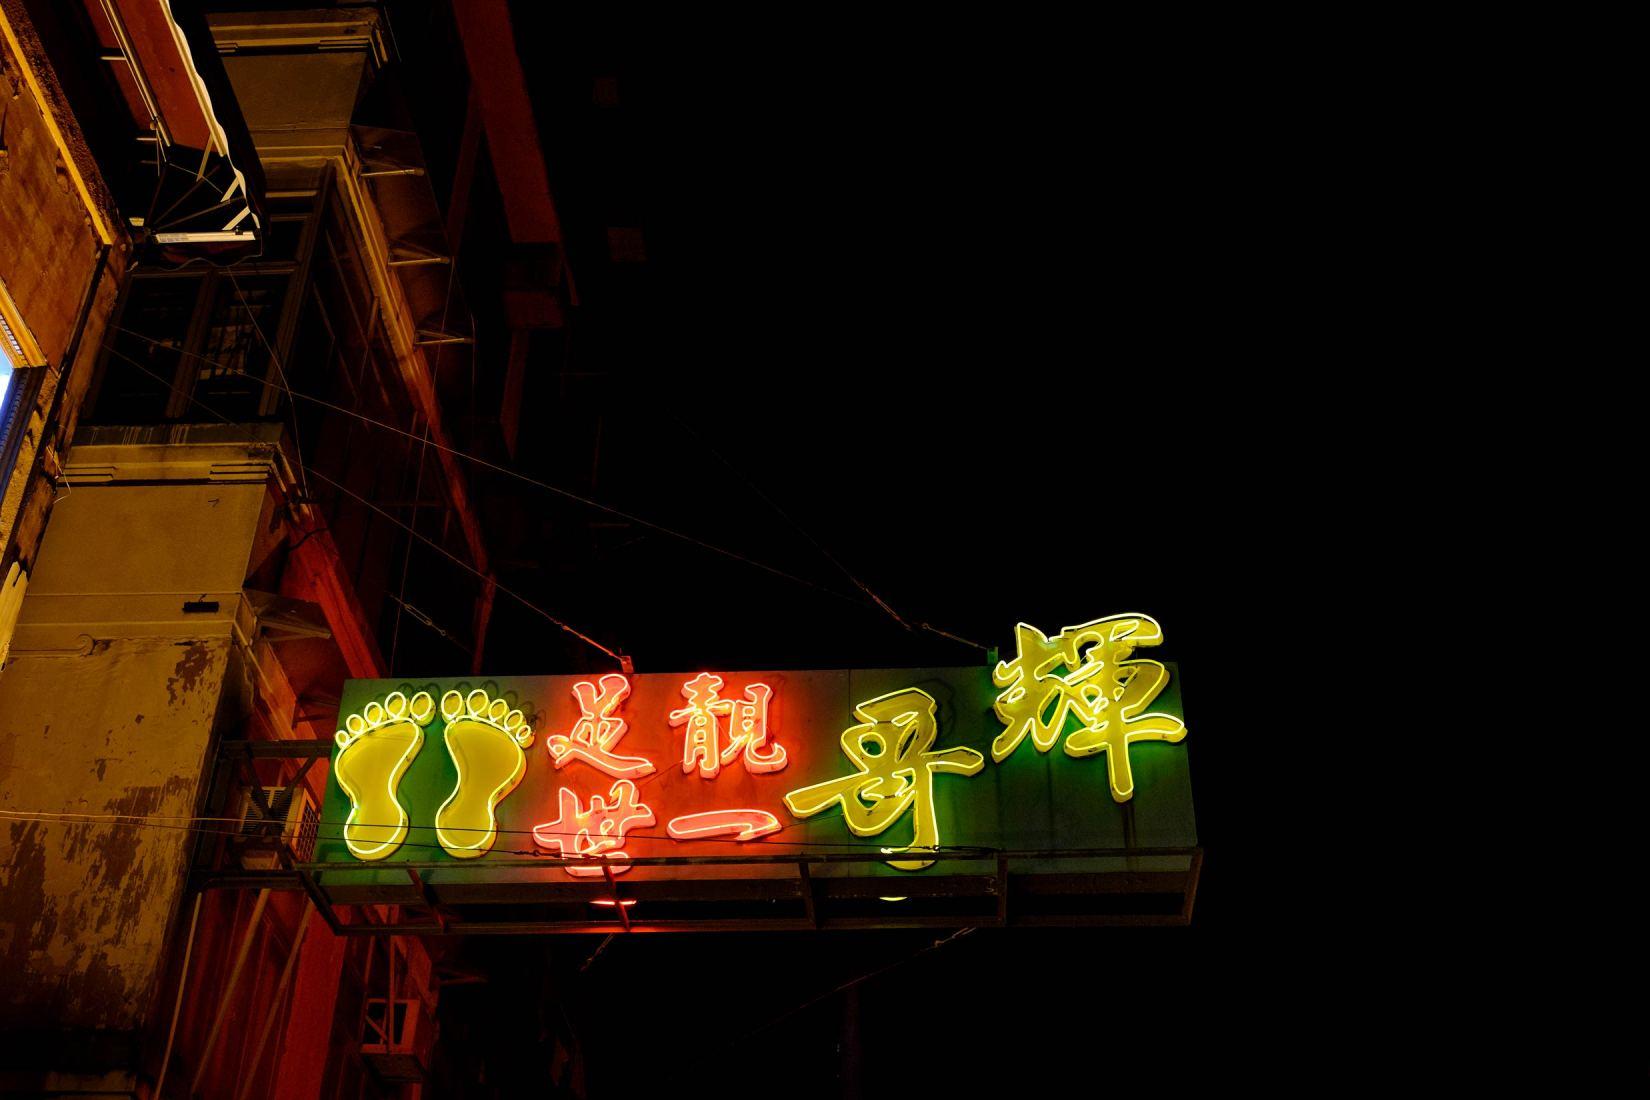 PWS020-0339-Sharon-Blance-Melbourne-photographer-Hong-Kong-neon